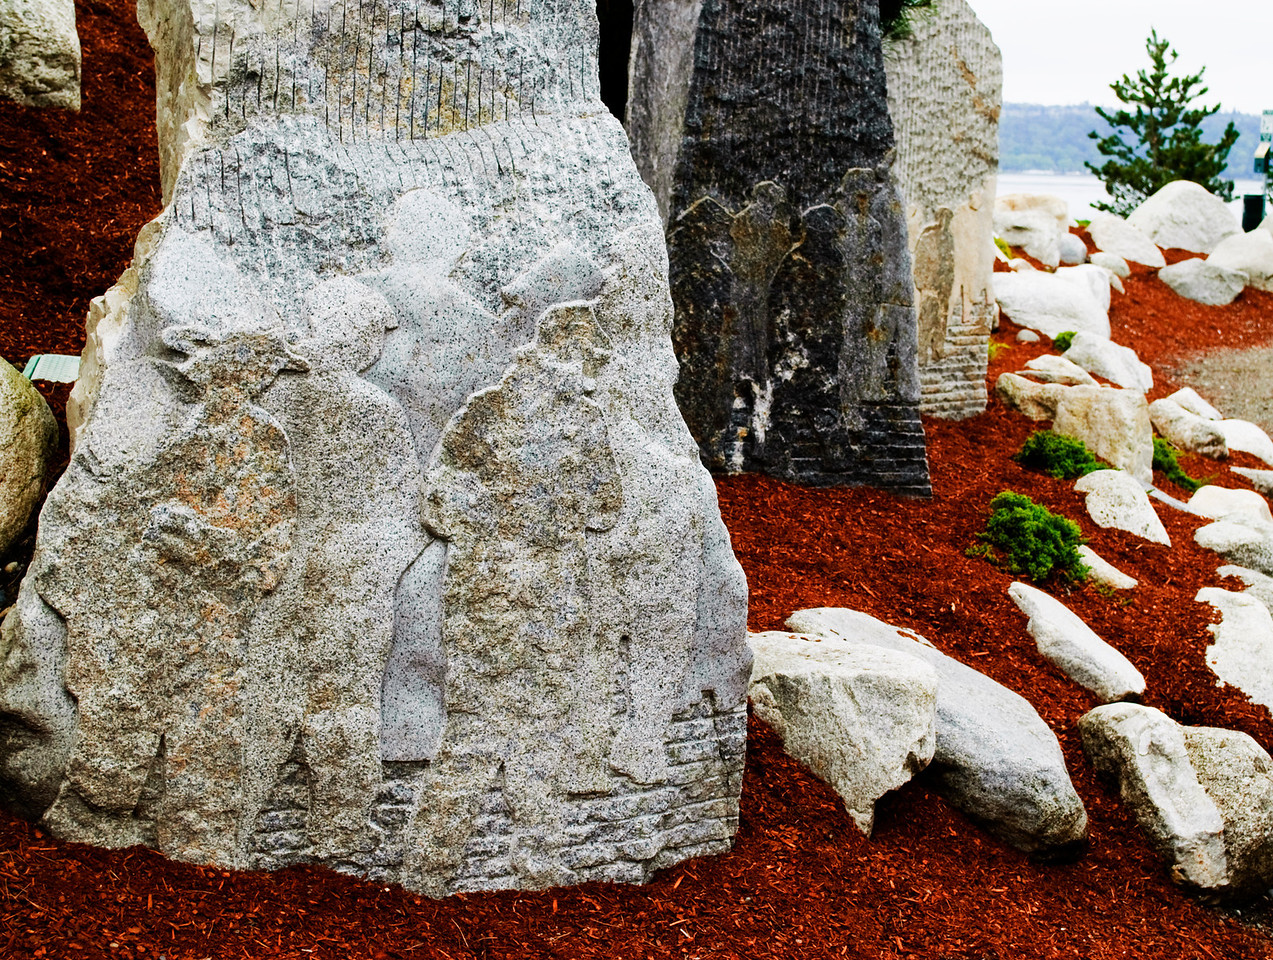 5.22.12  Stone Sculptures, Chinese Reconciliation Park  Tacoma, Washington